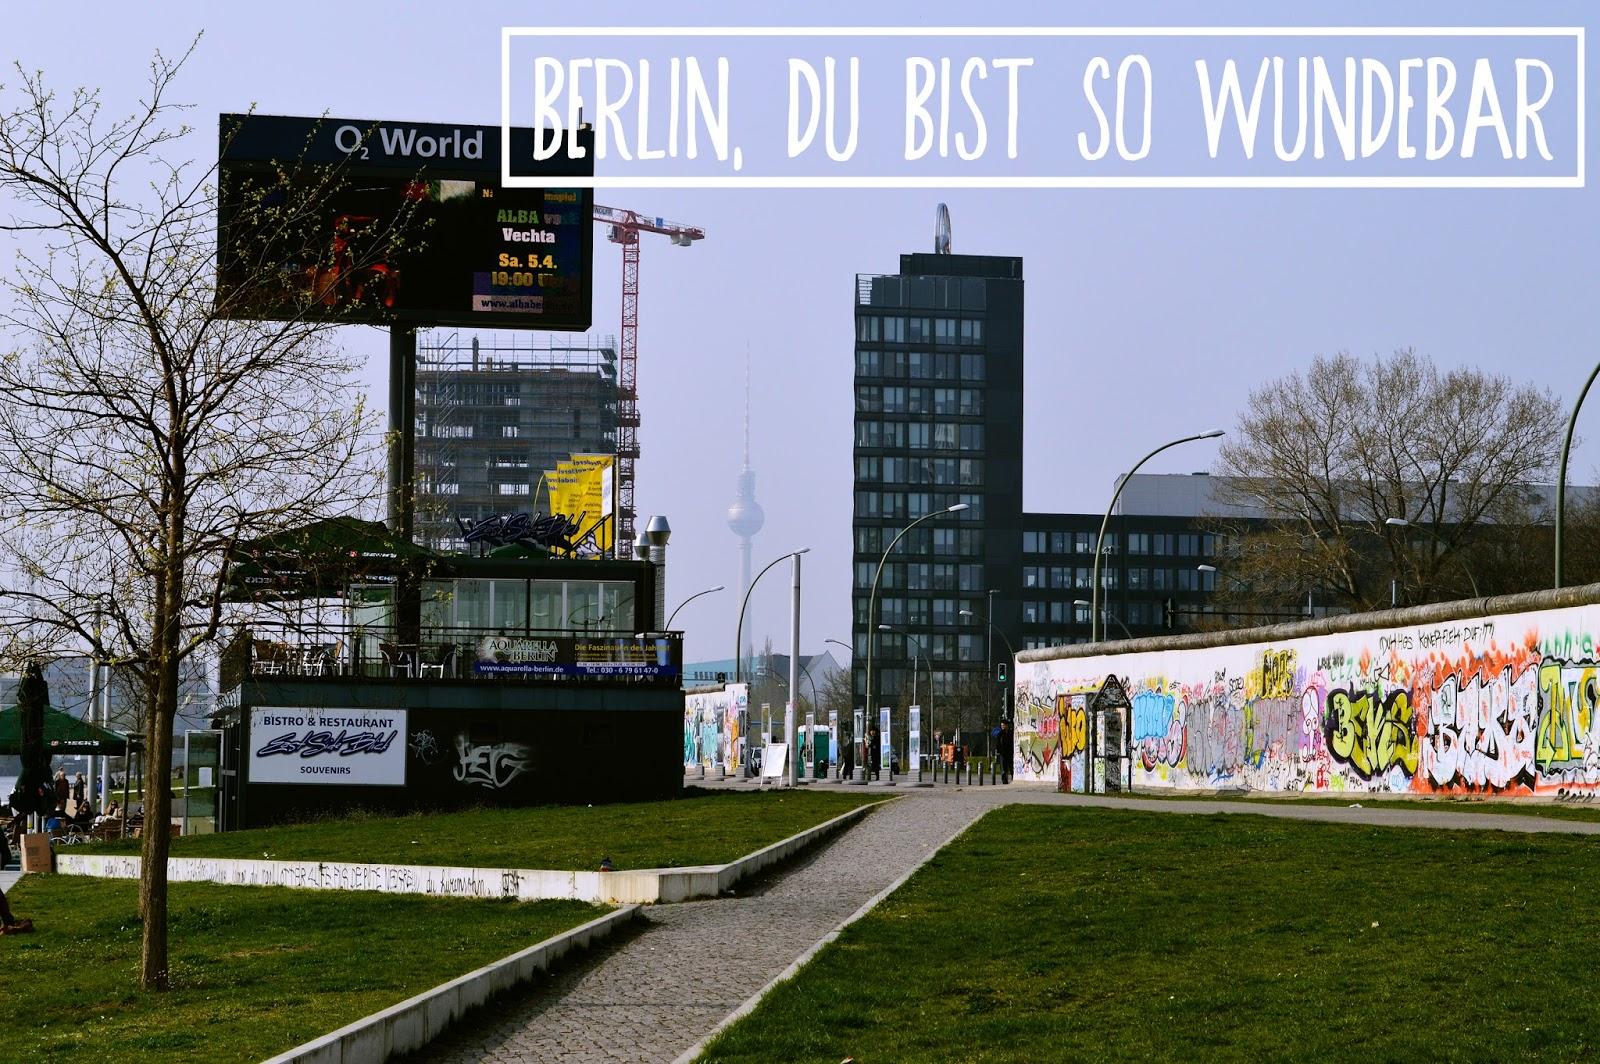 poppies in june berlin du bist so wunderbar teil 2. Black Bedroom Furniture Sets. Home Design Ideas